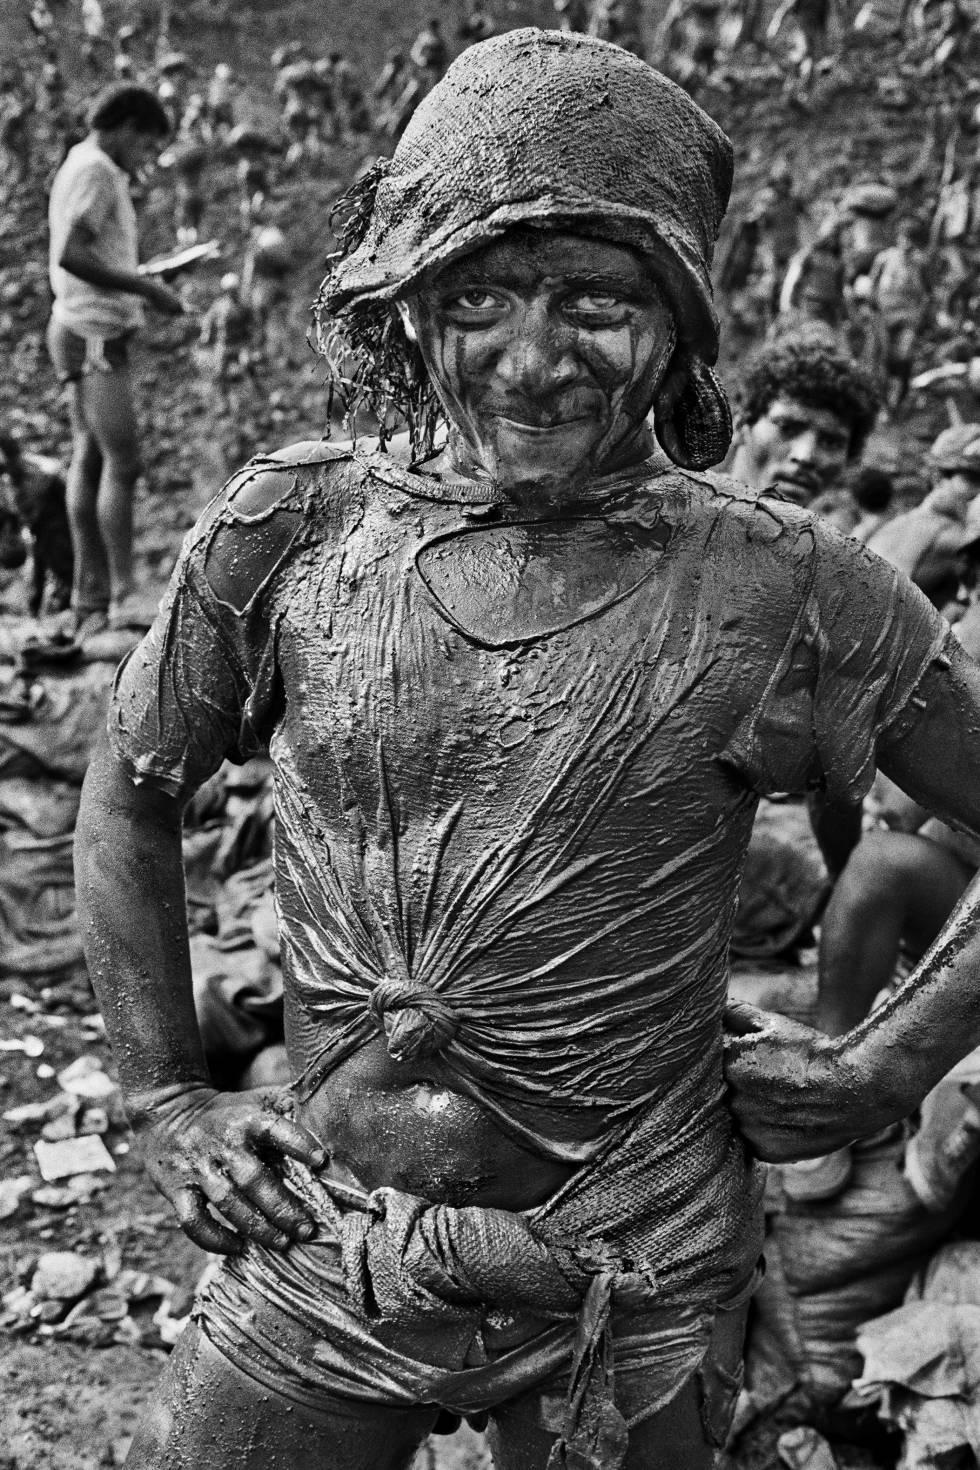 Una de las personas que llegó a Serra Pelada en la fiebre del oro, fotografiada en 1986.